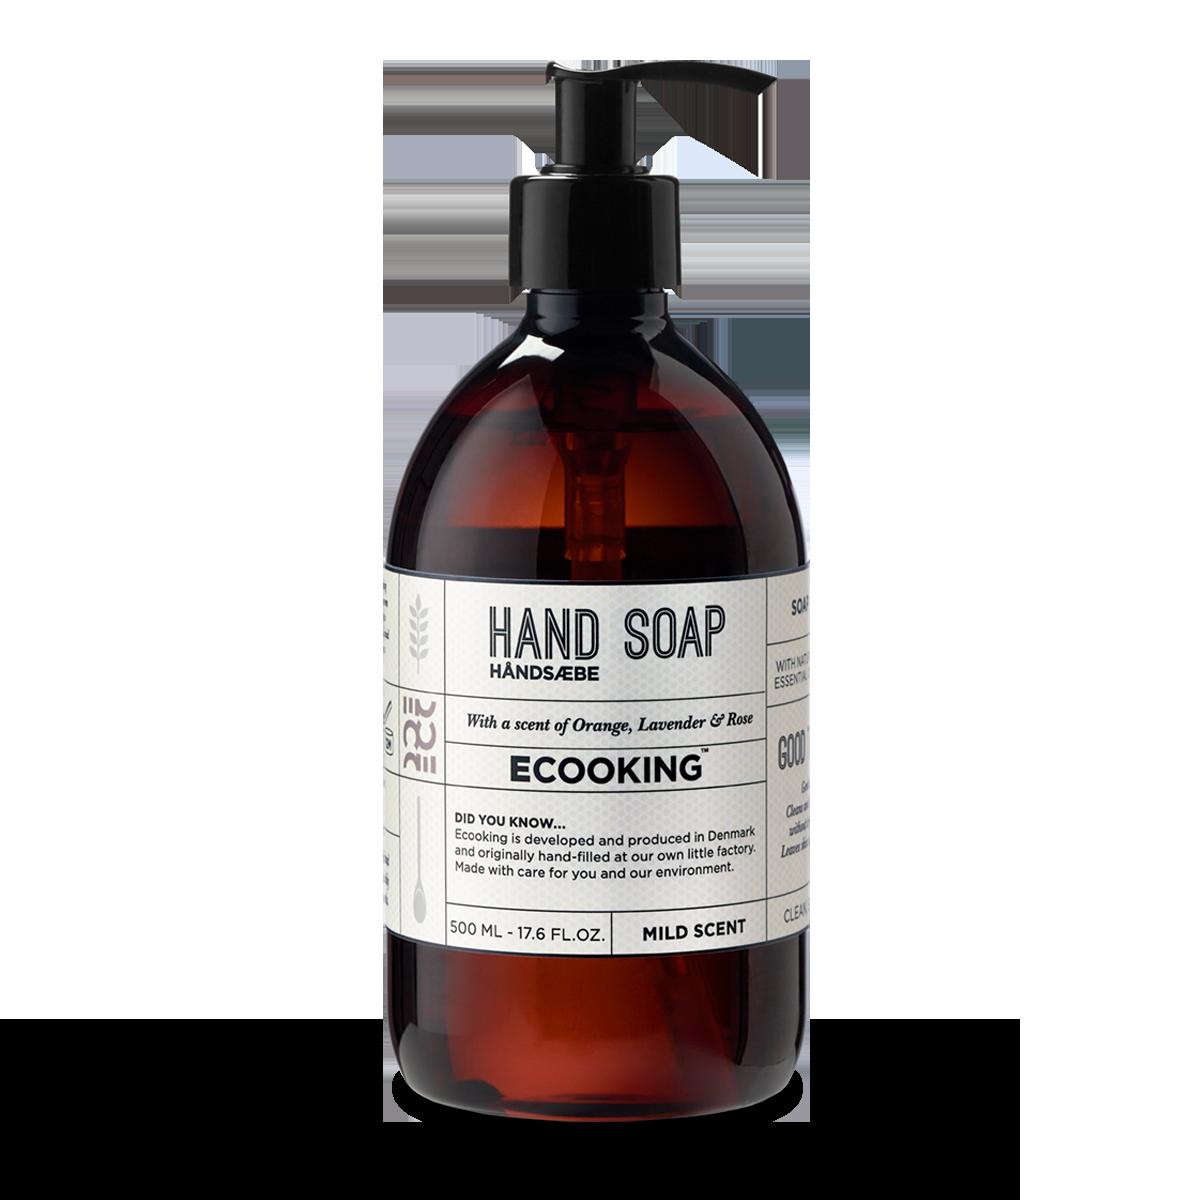 1200x1200_Hand_Soap_500ml